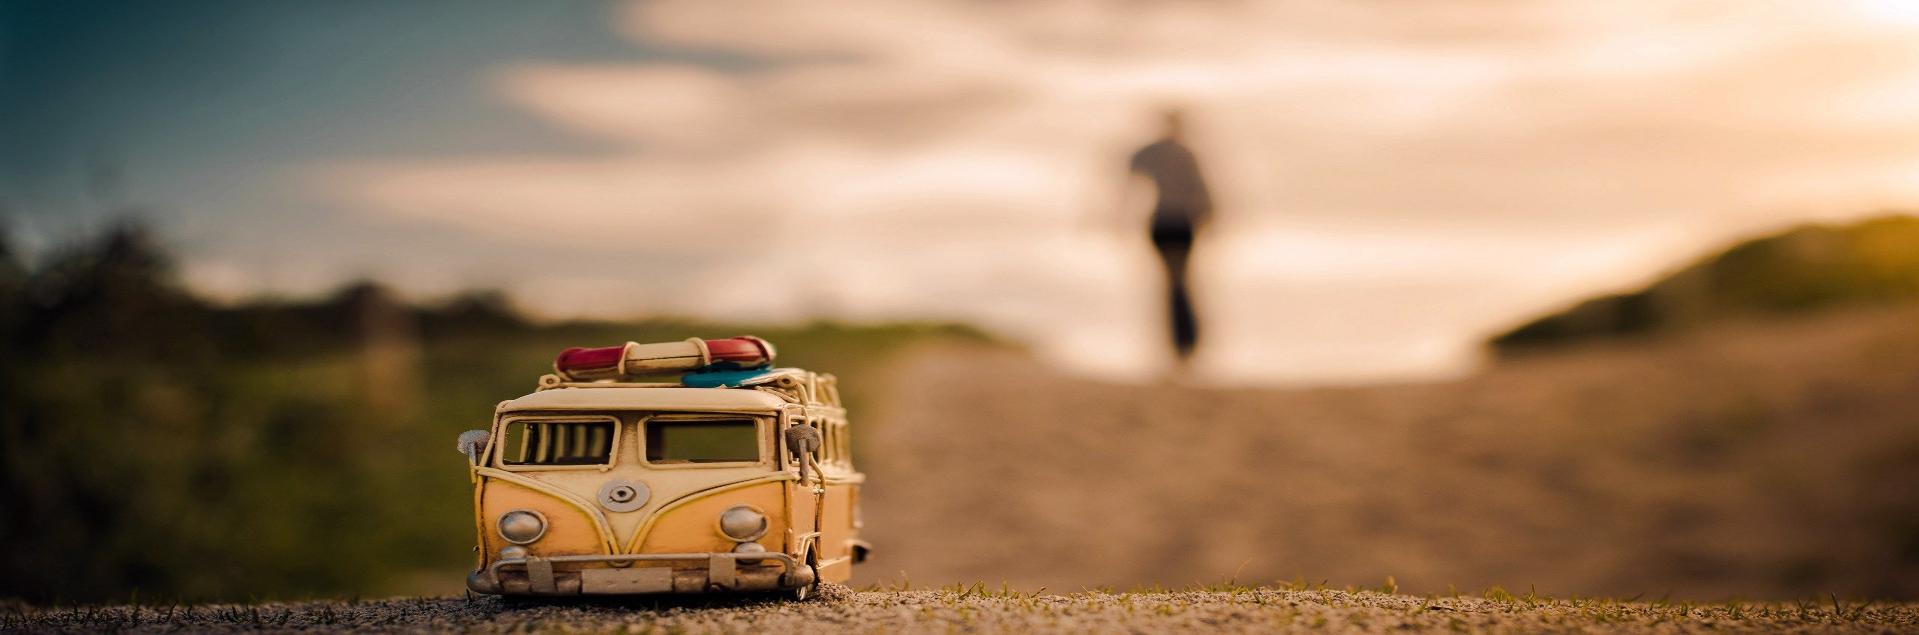 https://www.tomastouch.fr/70-vehicules-miniatures-de-collection